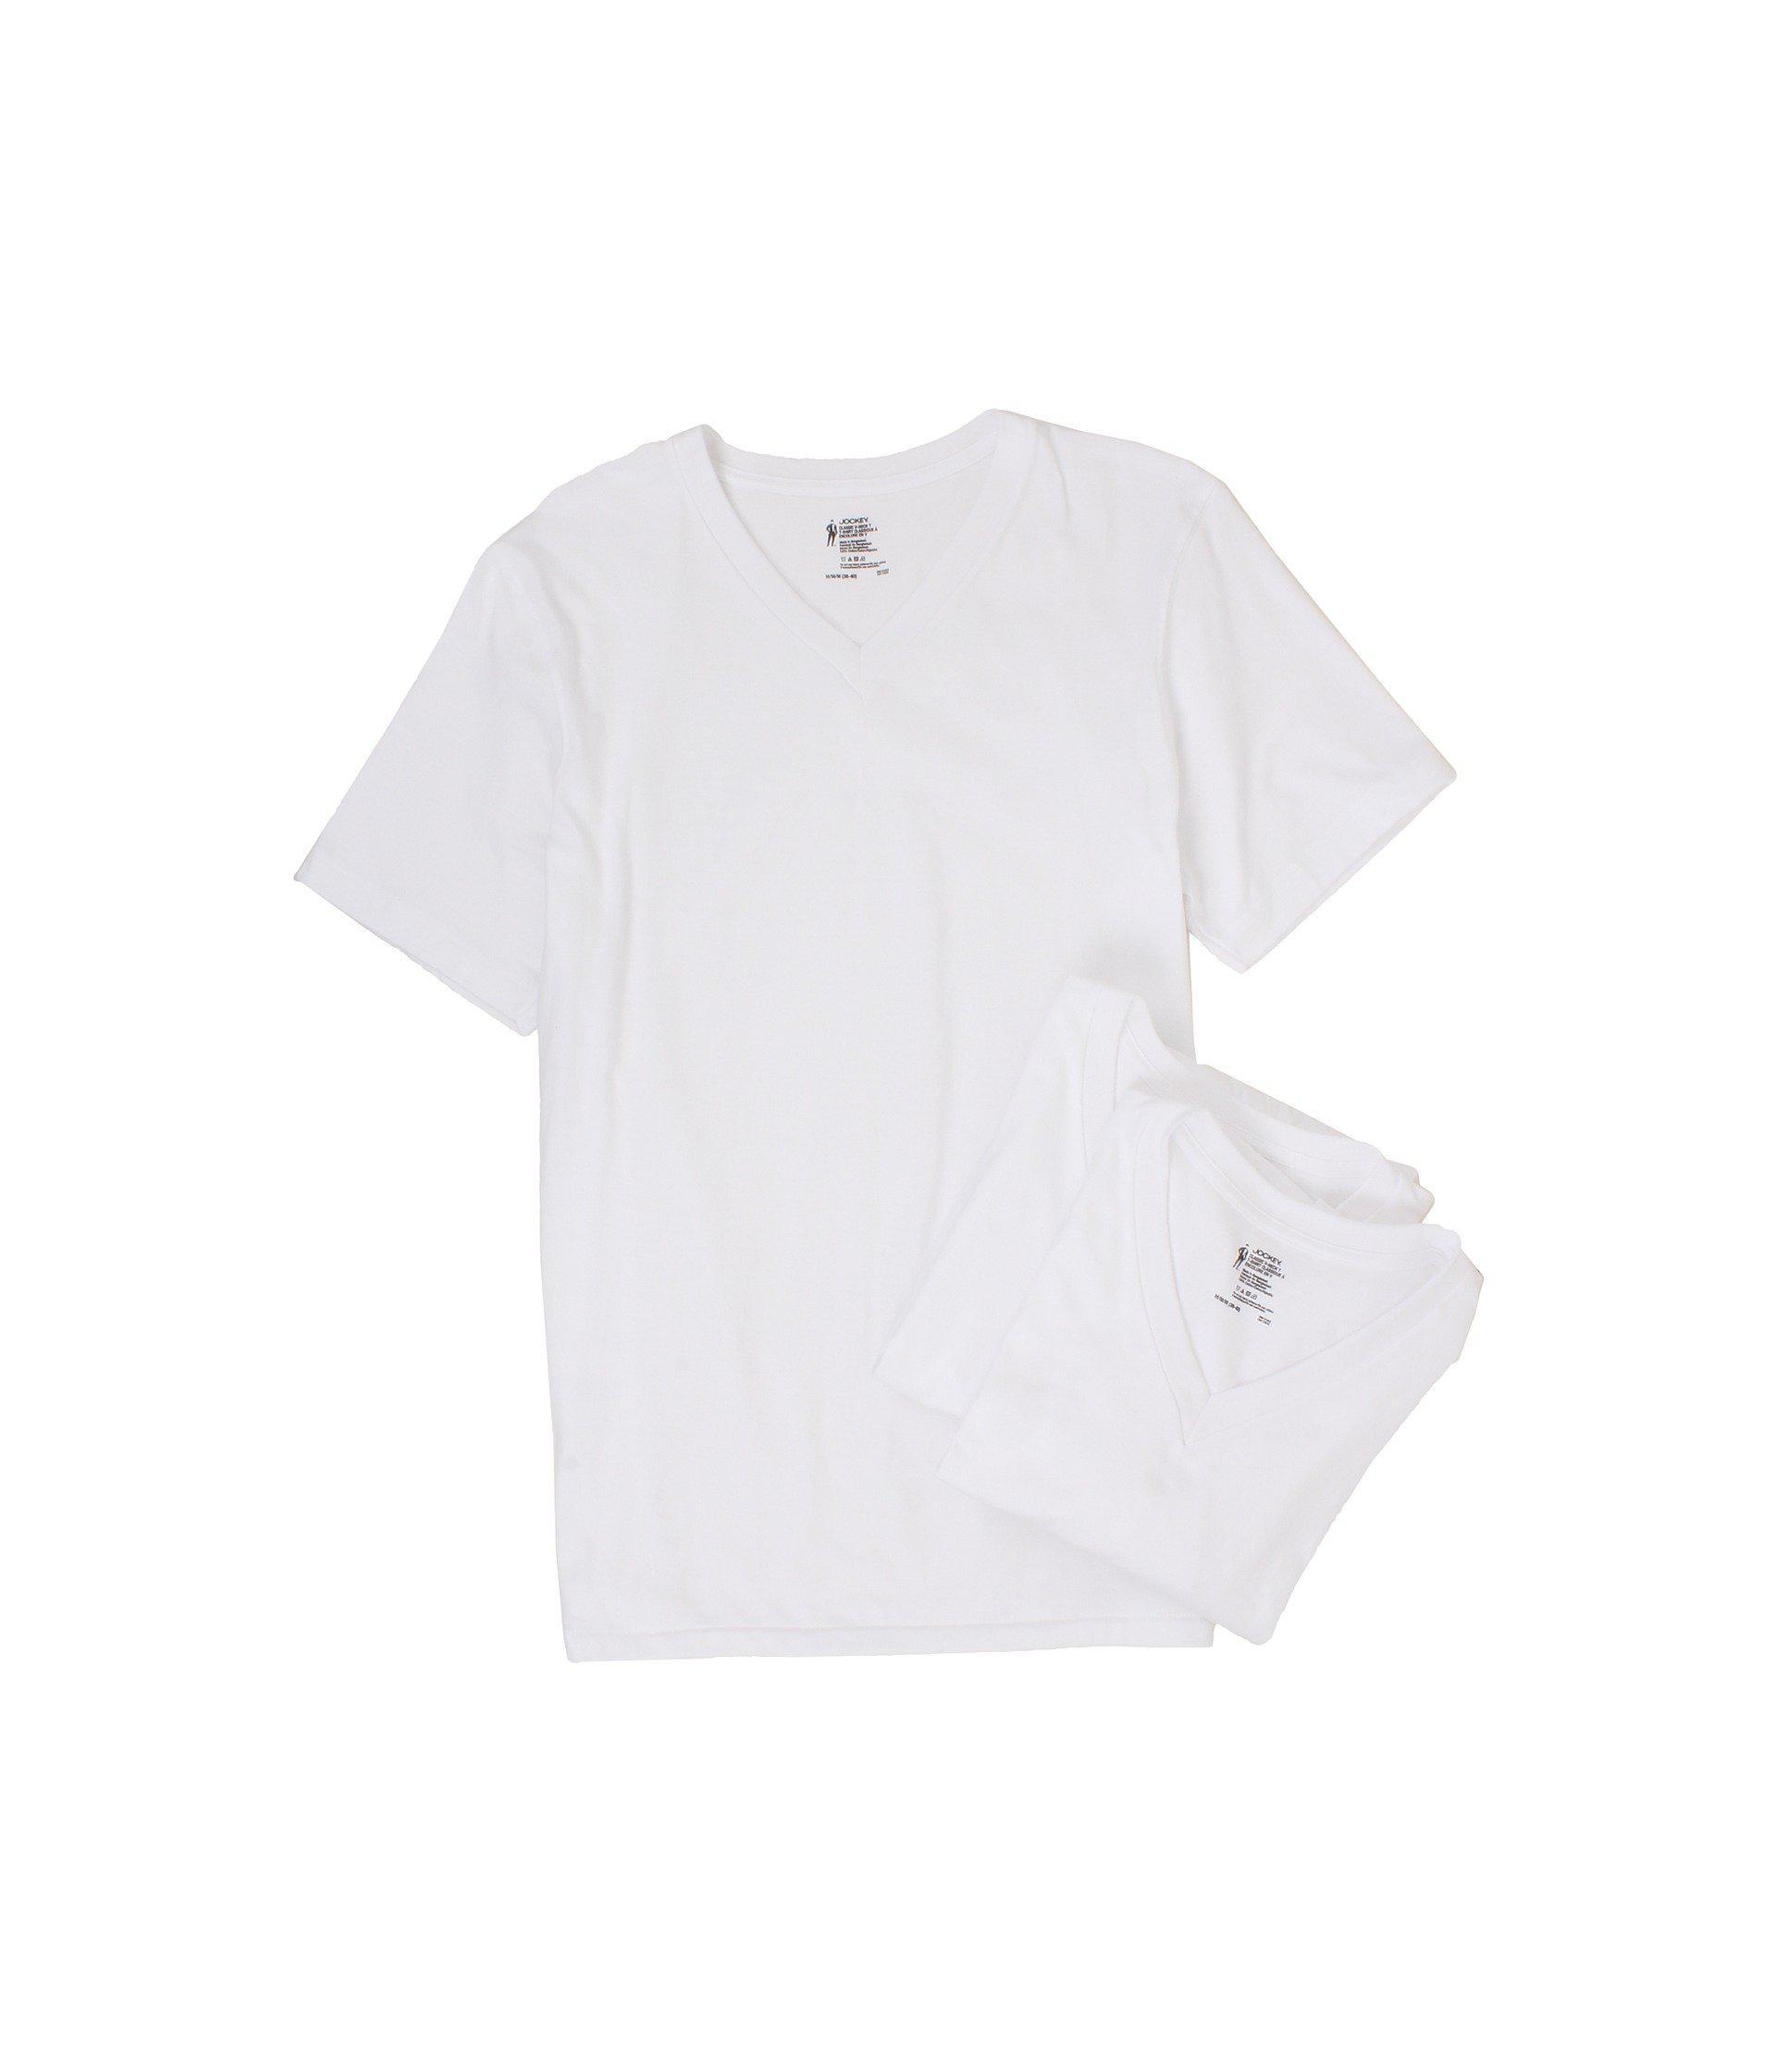 5fb24316 Mens Long Sleeve Cotton Undershirts – EDGE Engineering and ...